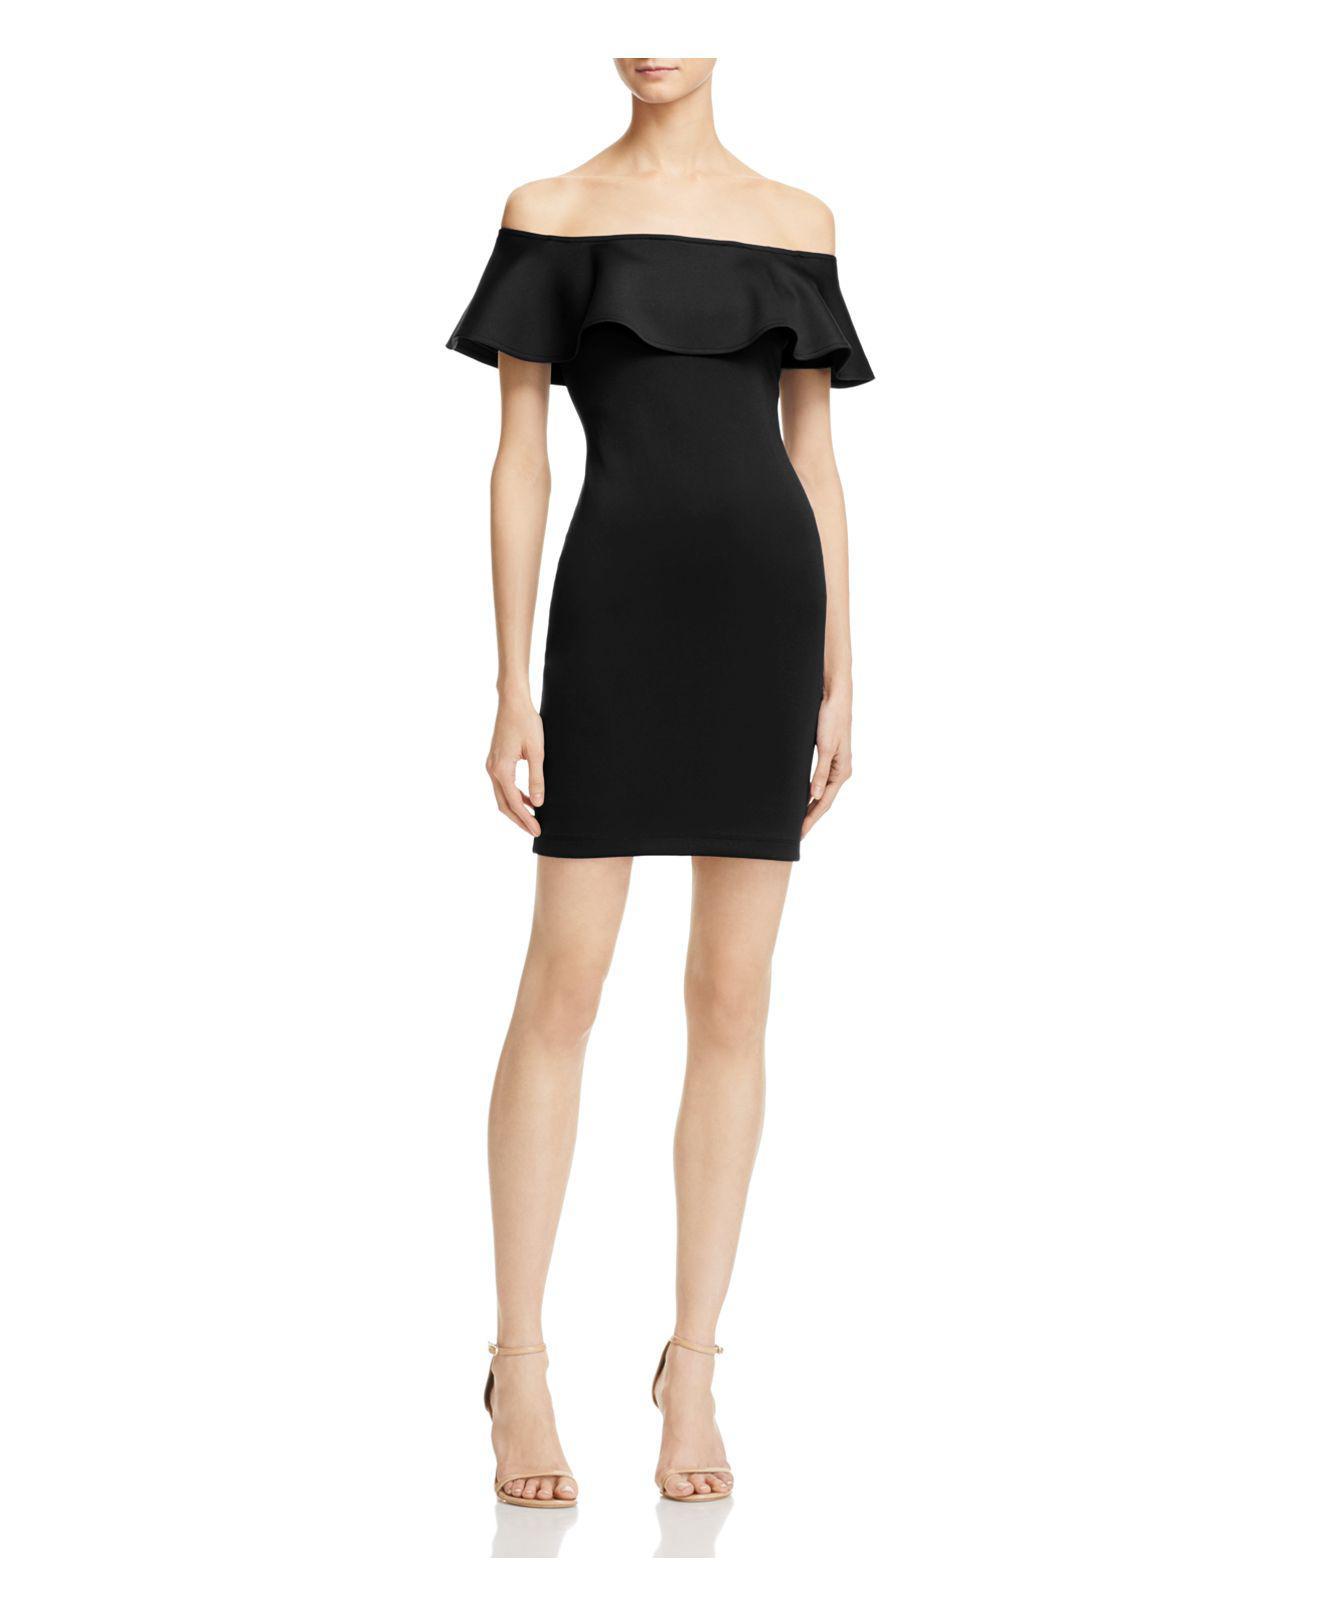 Guess Tori Off The Shoulder Ruffle Dress In Black Lyst